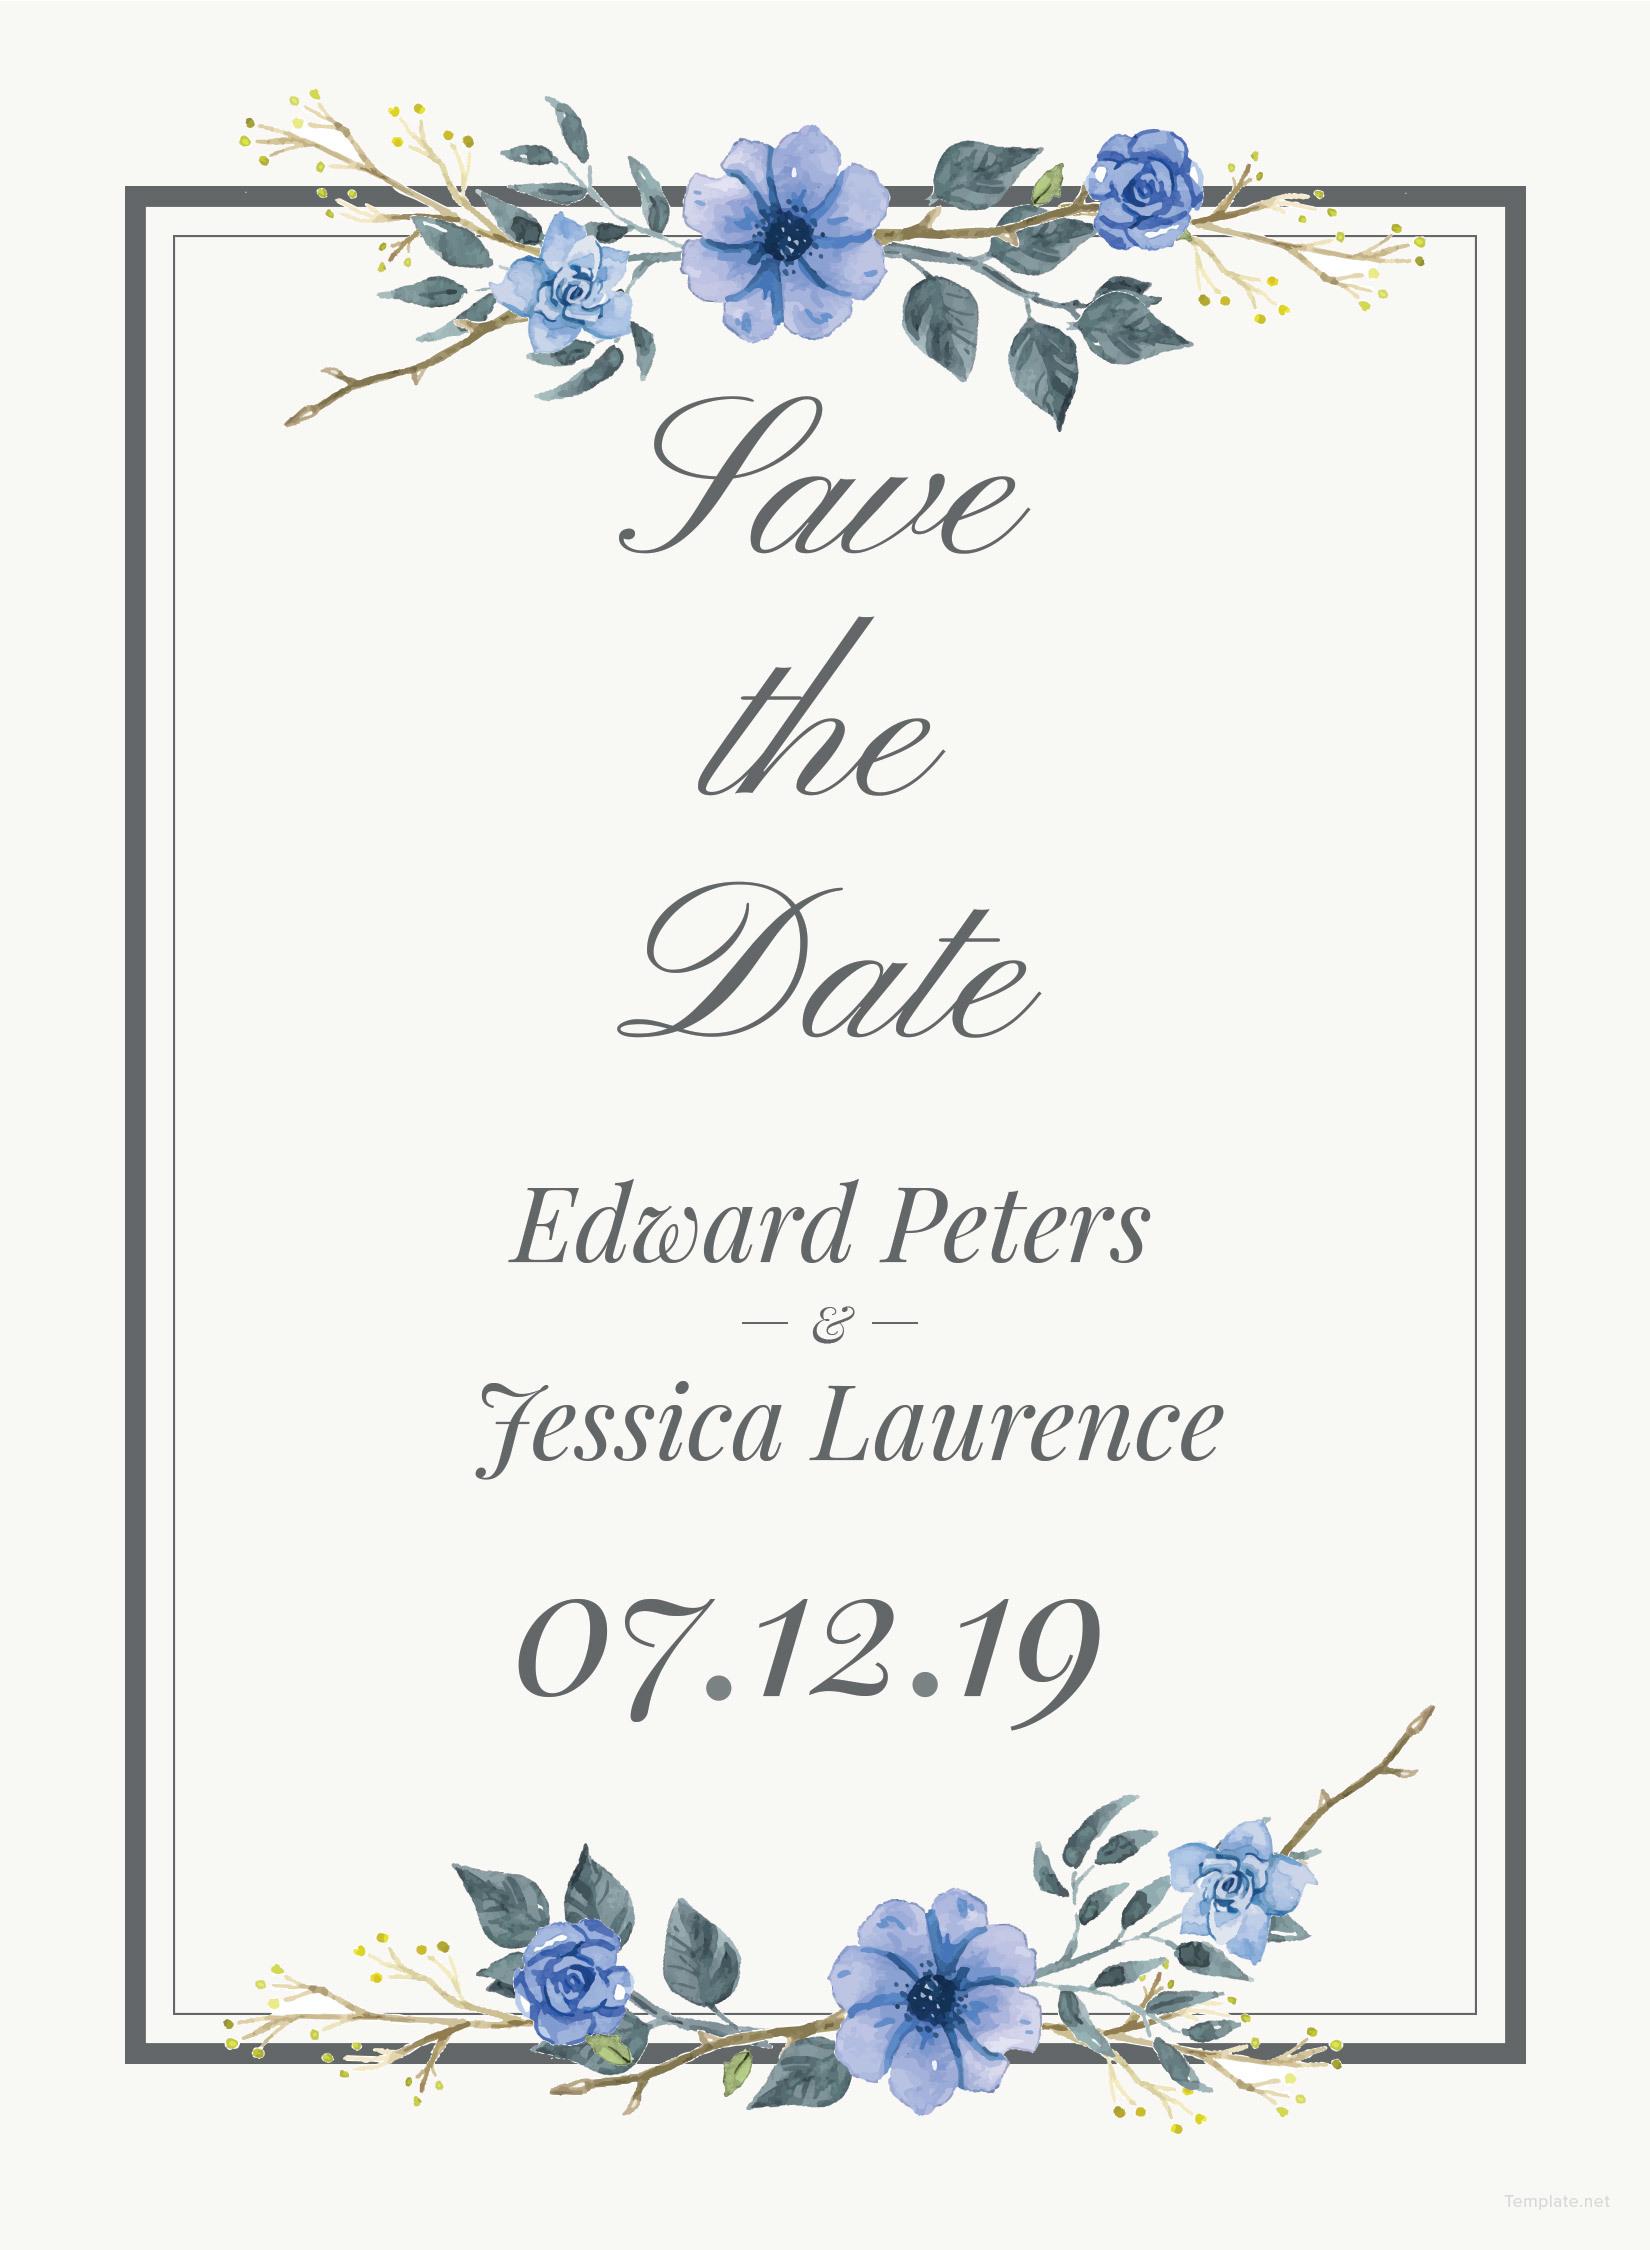 Wedding Invitation Card Template in Adobe Photoshop, Illustrator ...